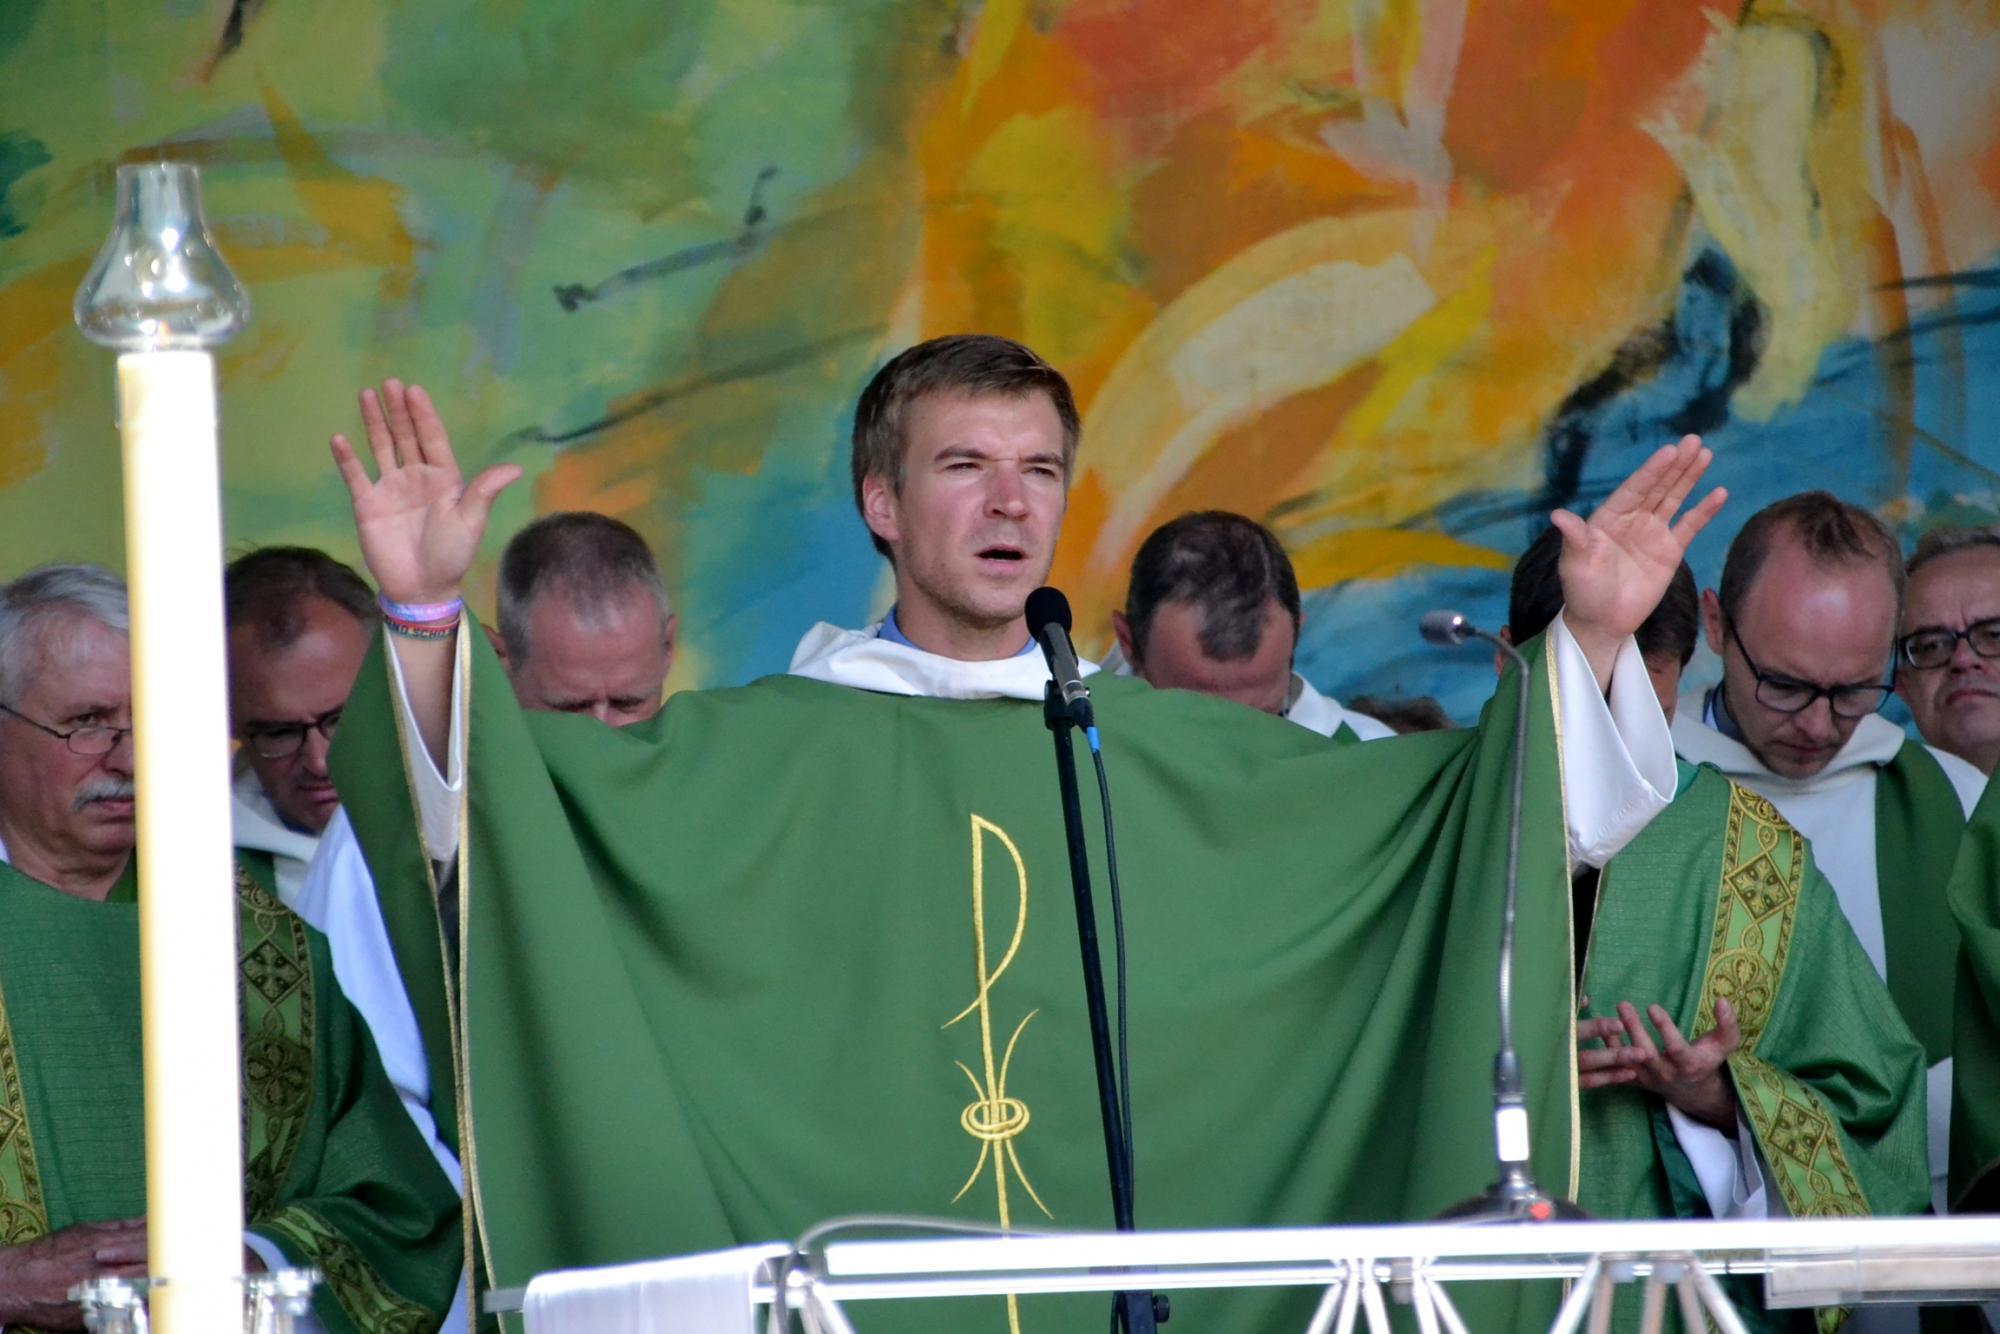 Neupriester-Gregor-Schweizer